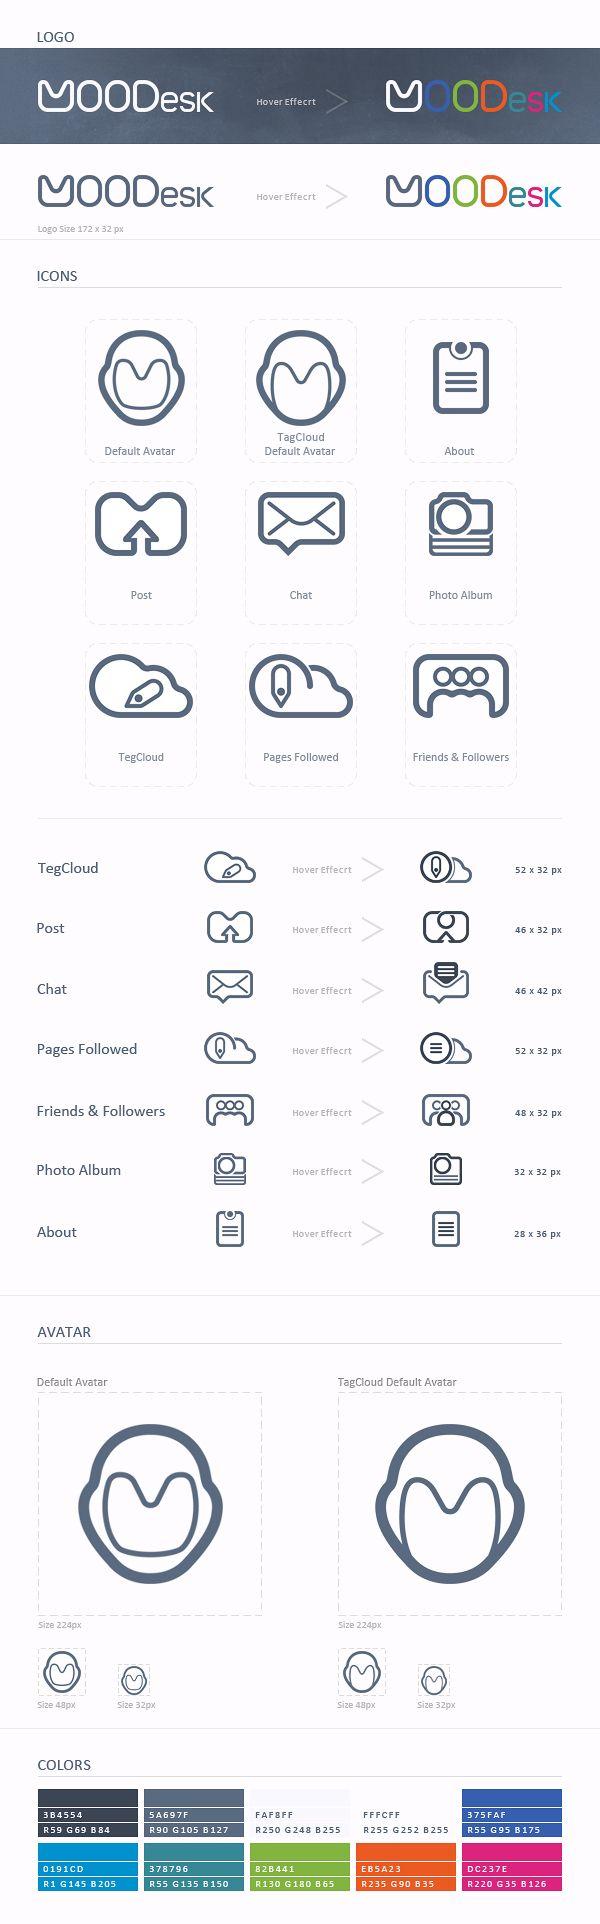 Social Platform  MOODesk - Design Icons by David T, via Behance